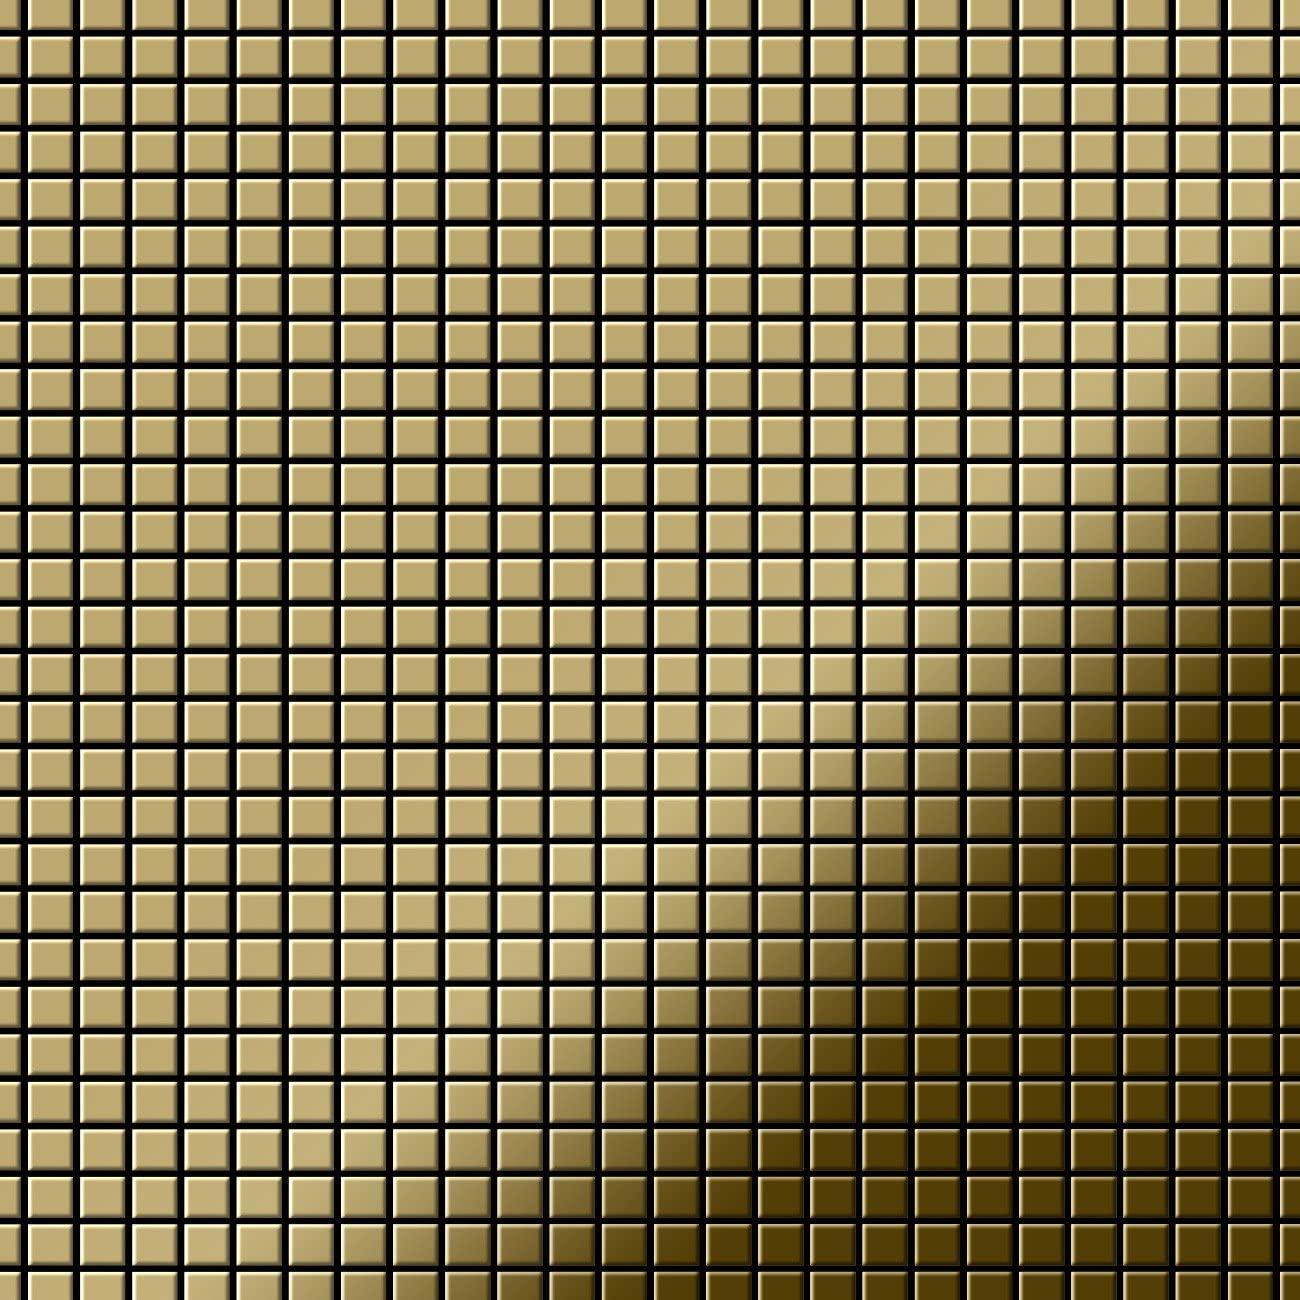 Mosaic Tile massiv Metal Titanium Gold Mirror Gold 1.6mm Thick ALLOY Glomesh-Ti-GM